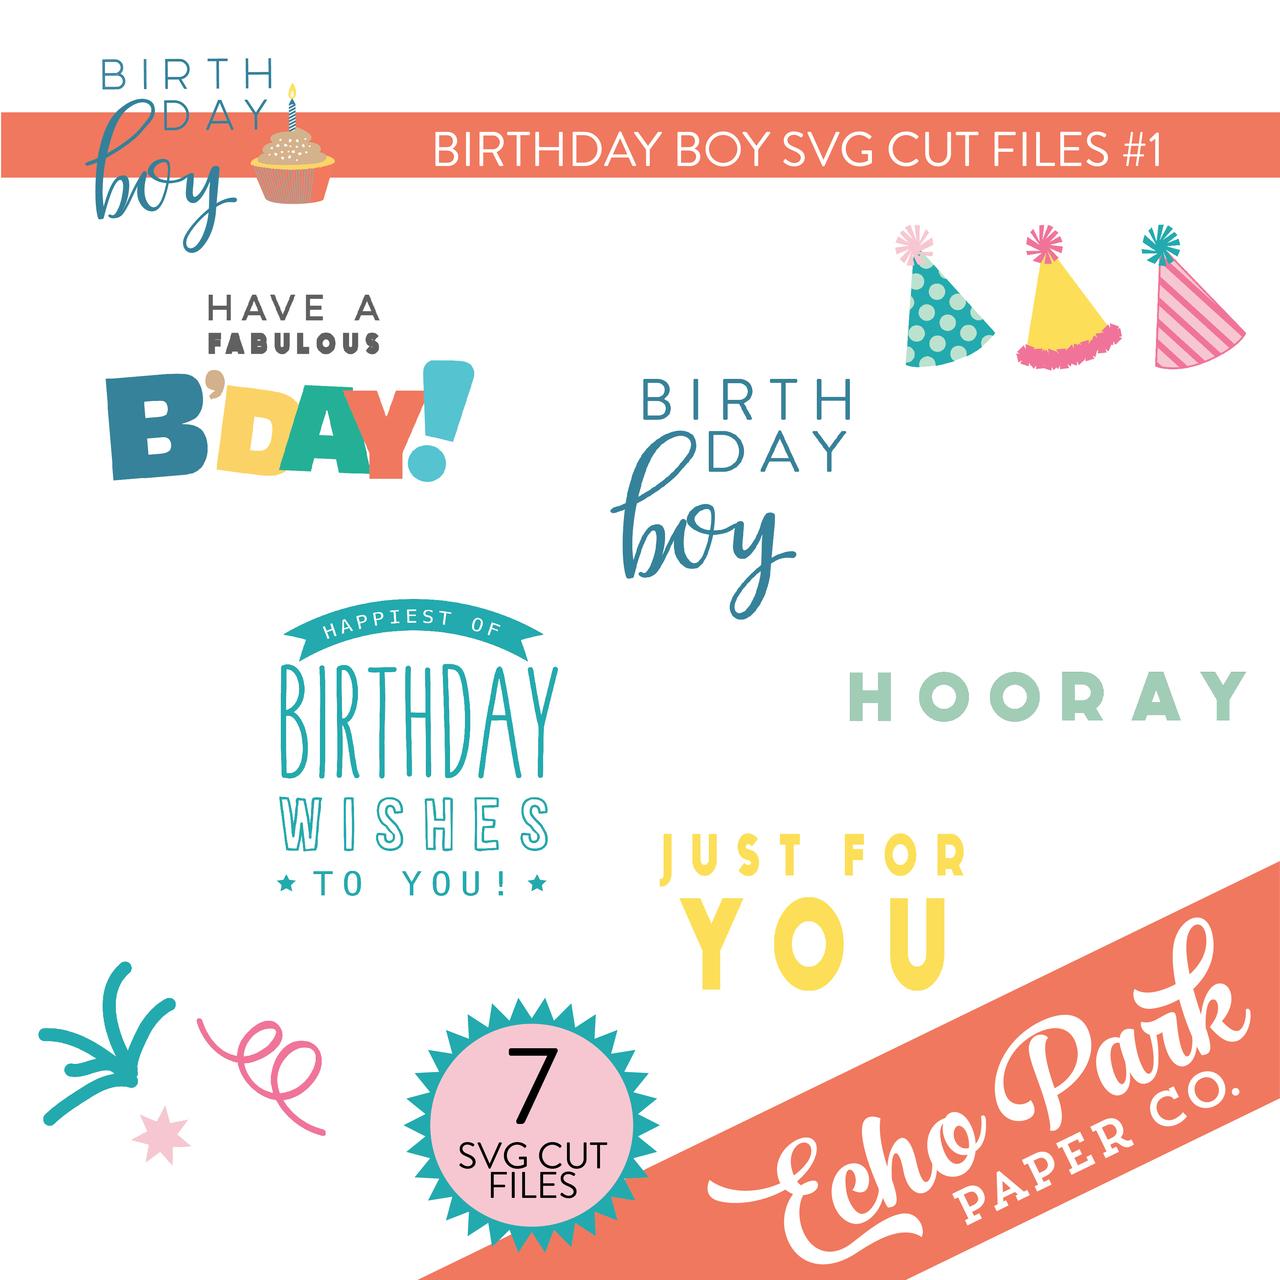 Birthday Boy SVG Cut Files #1